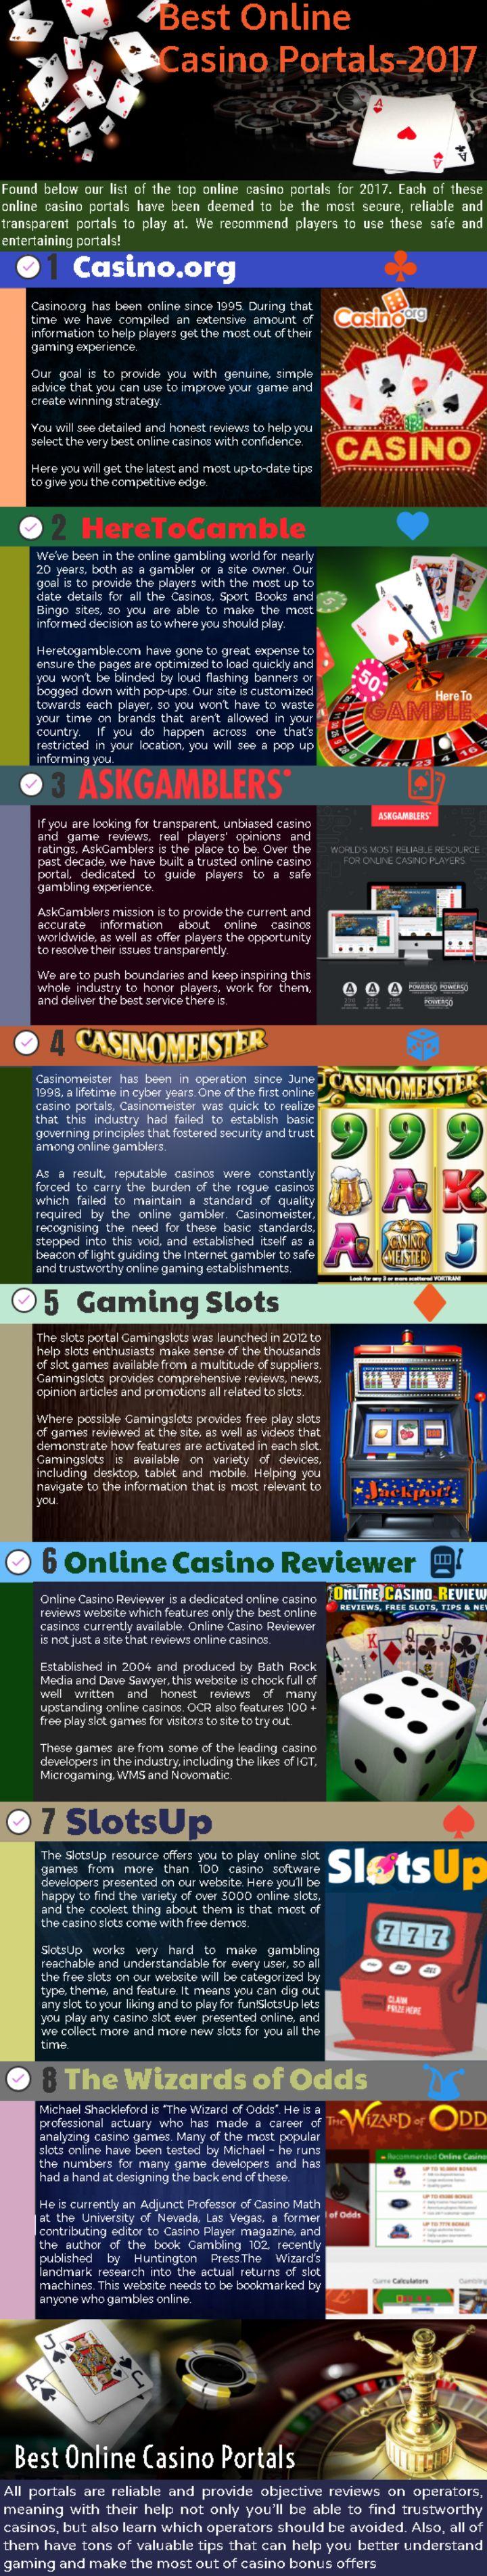 Casino game internet portal site 4 queens casino